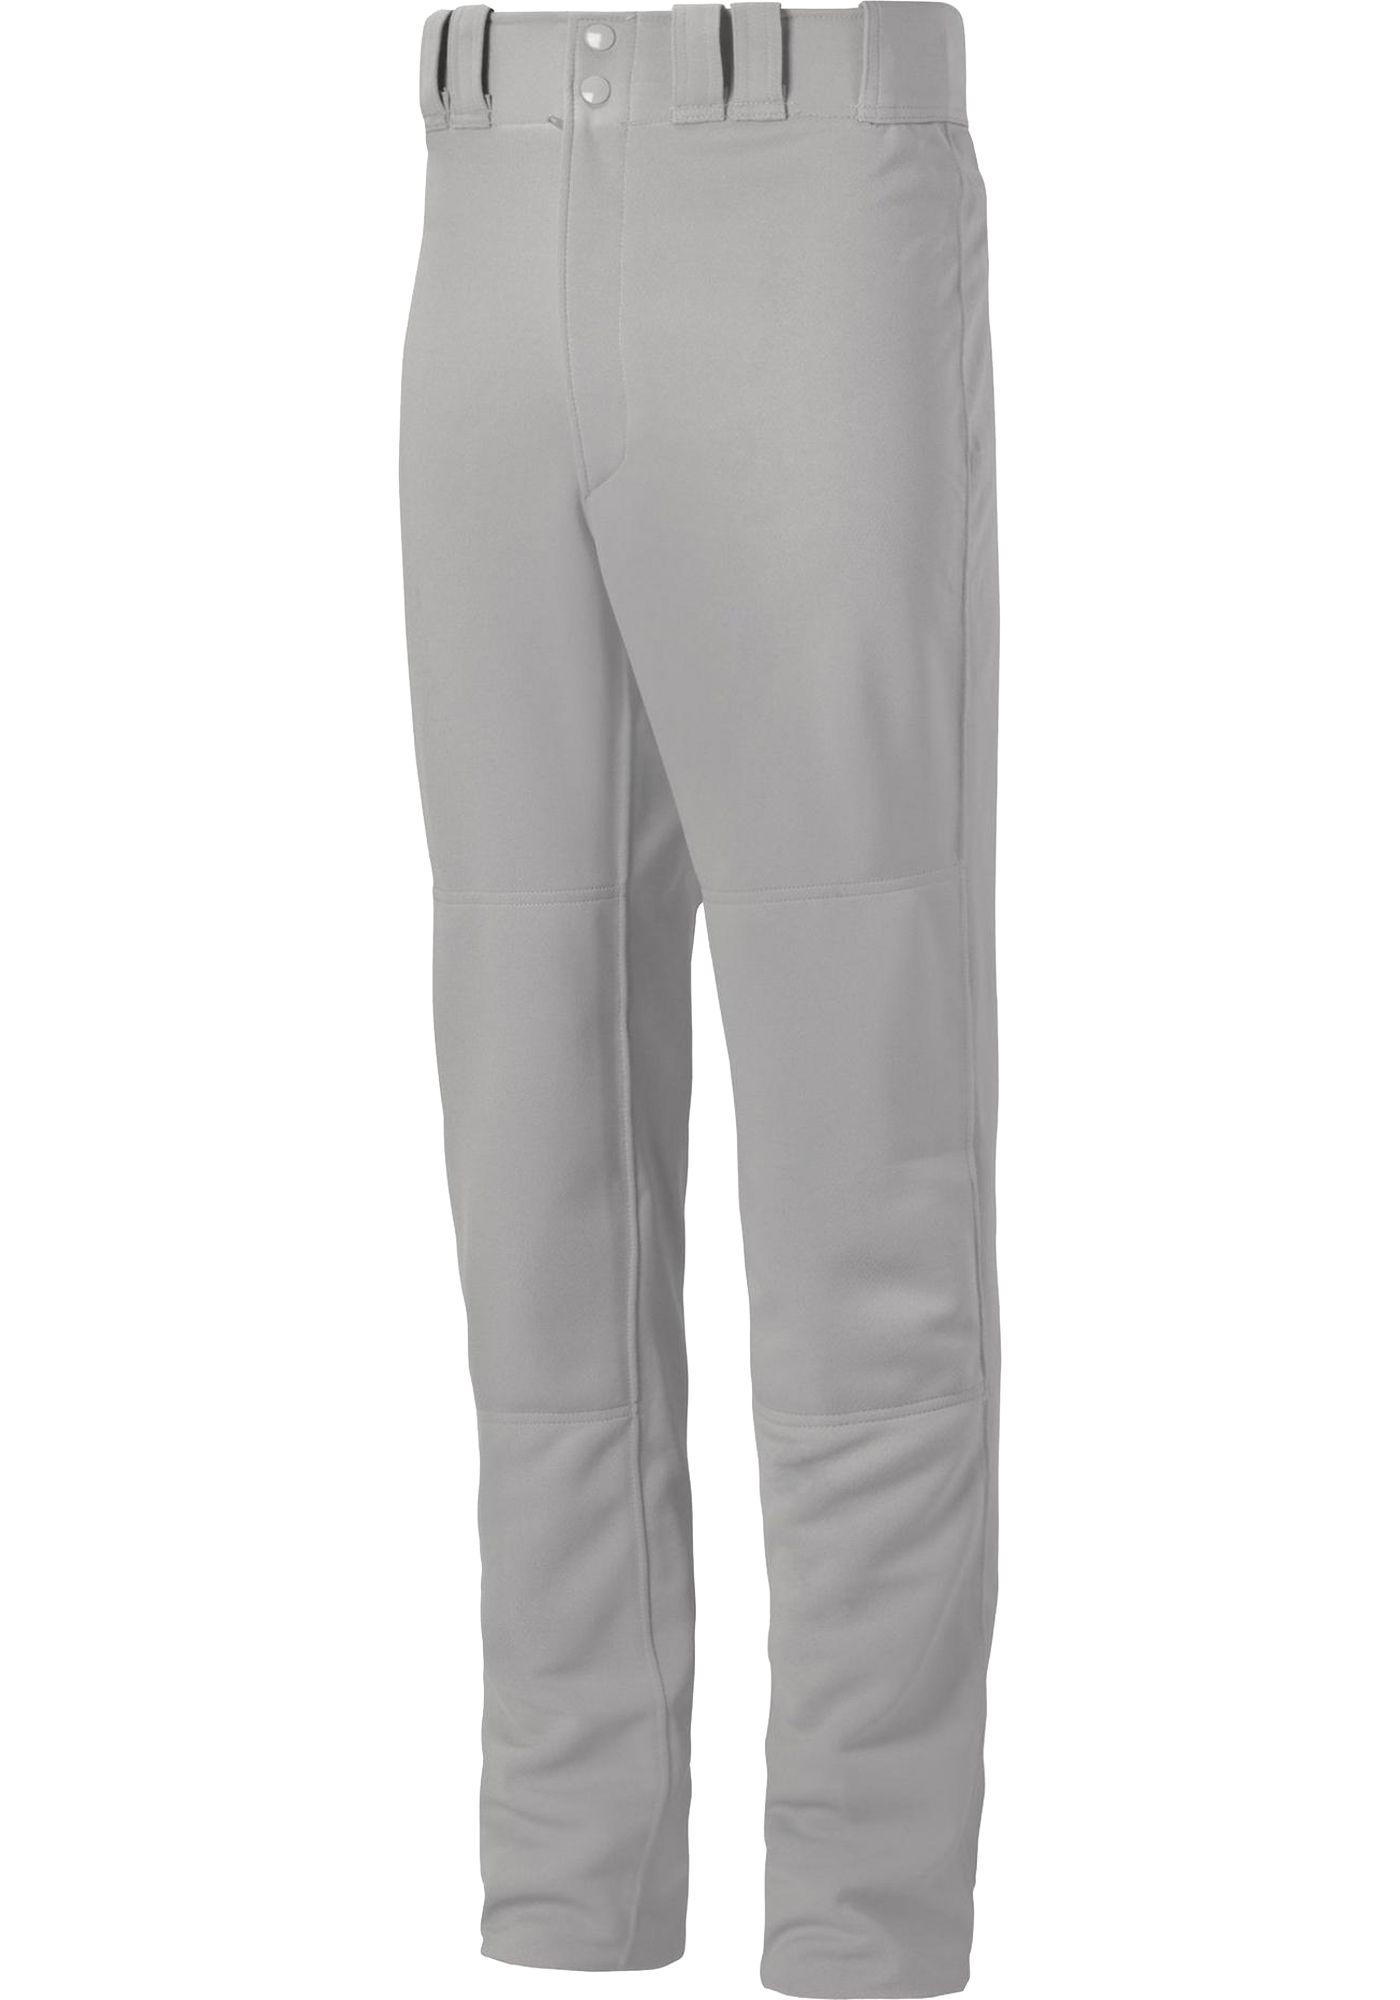 Mizuno Men's Preimer Pro Baseball Pants